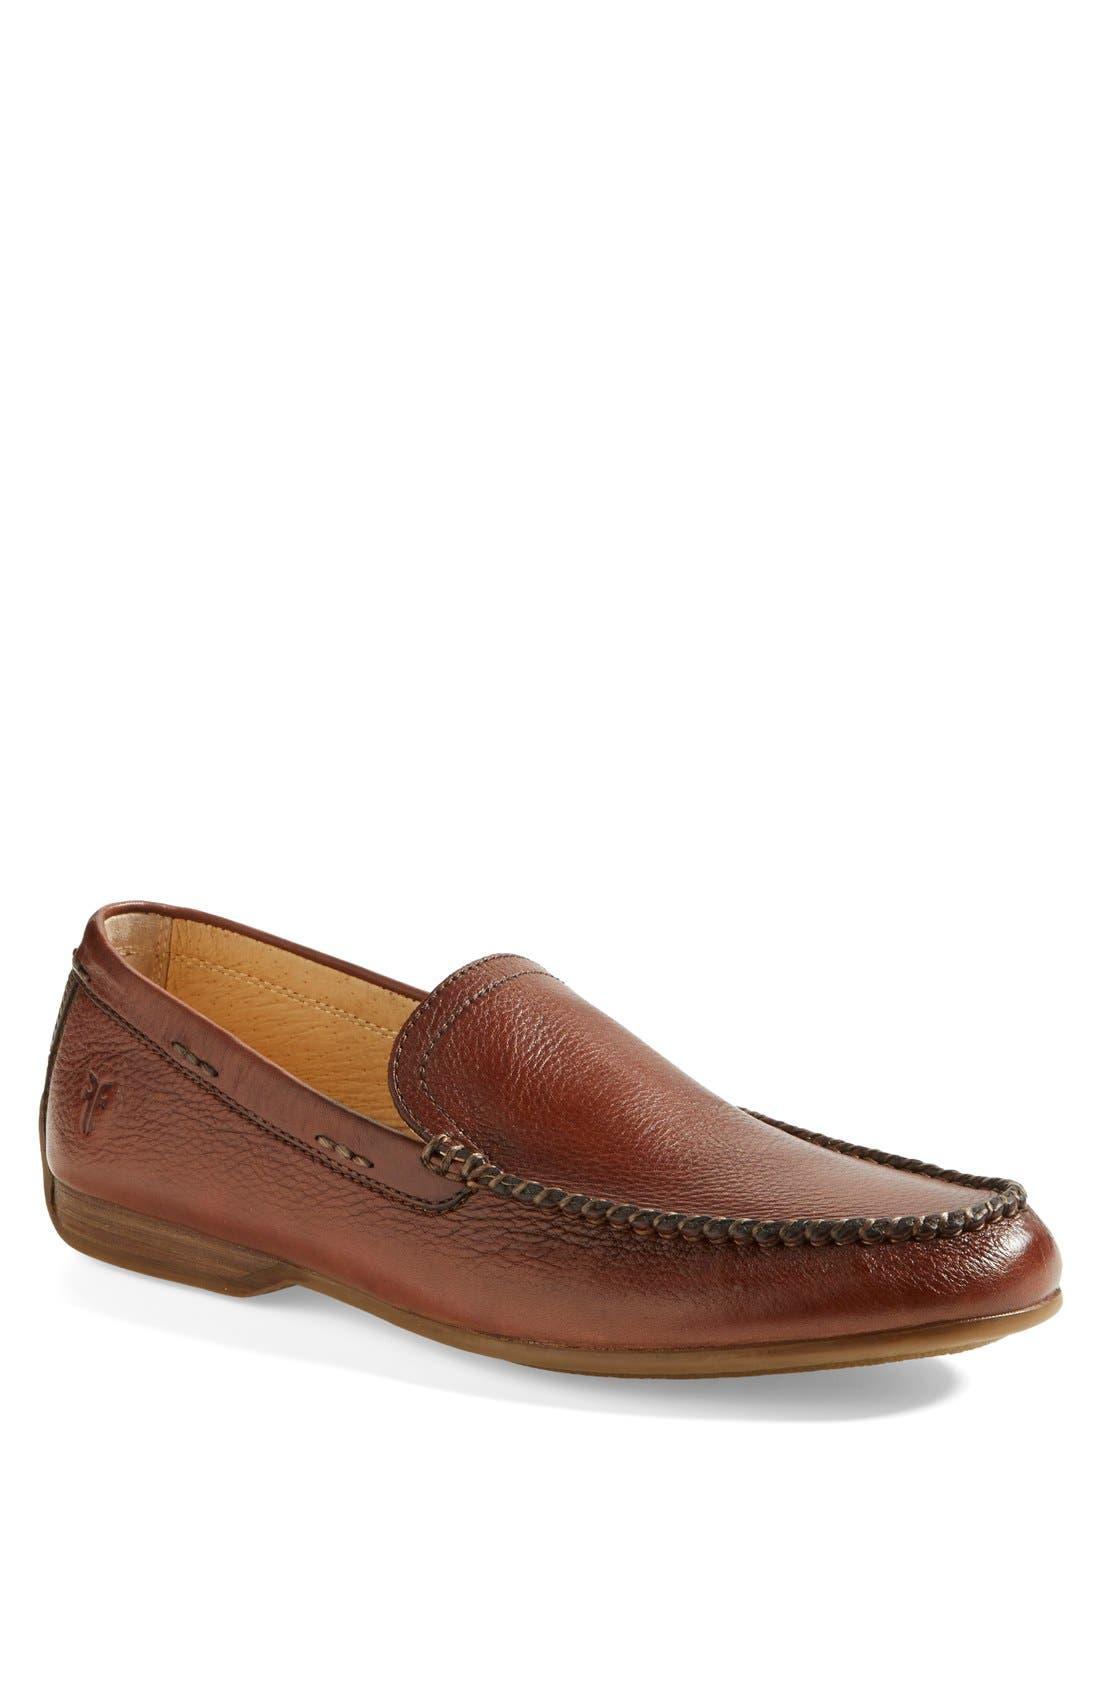 Alternate Image 1 Selected - Frye 'Lewis' Venetian Loafer (Men)